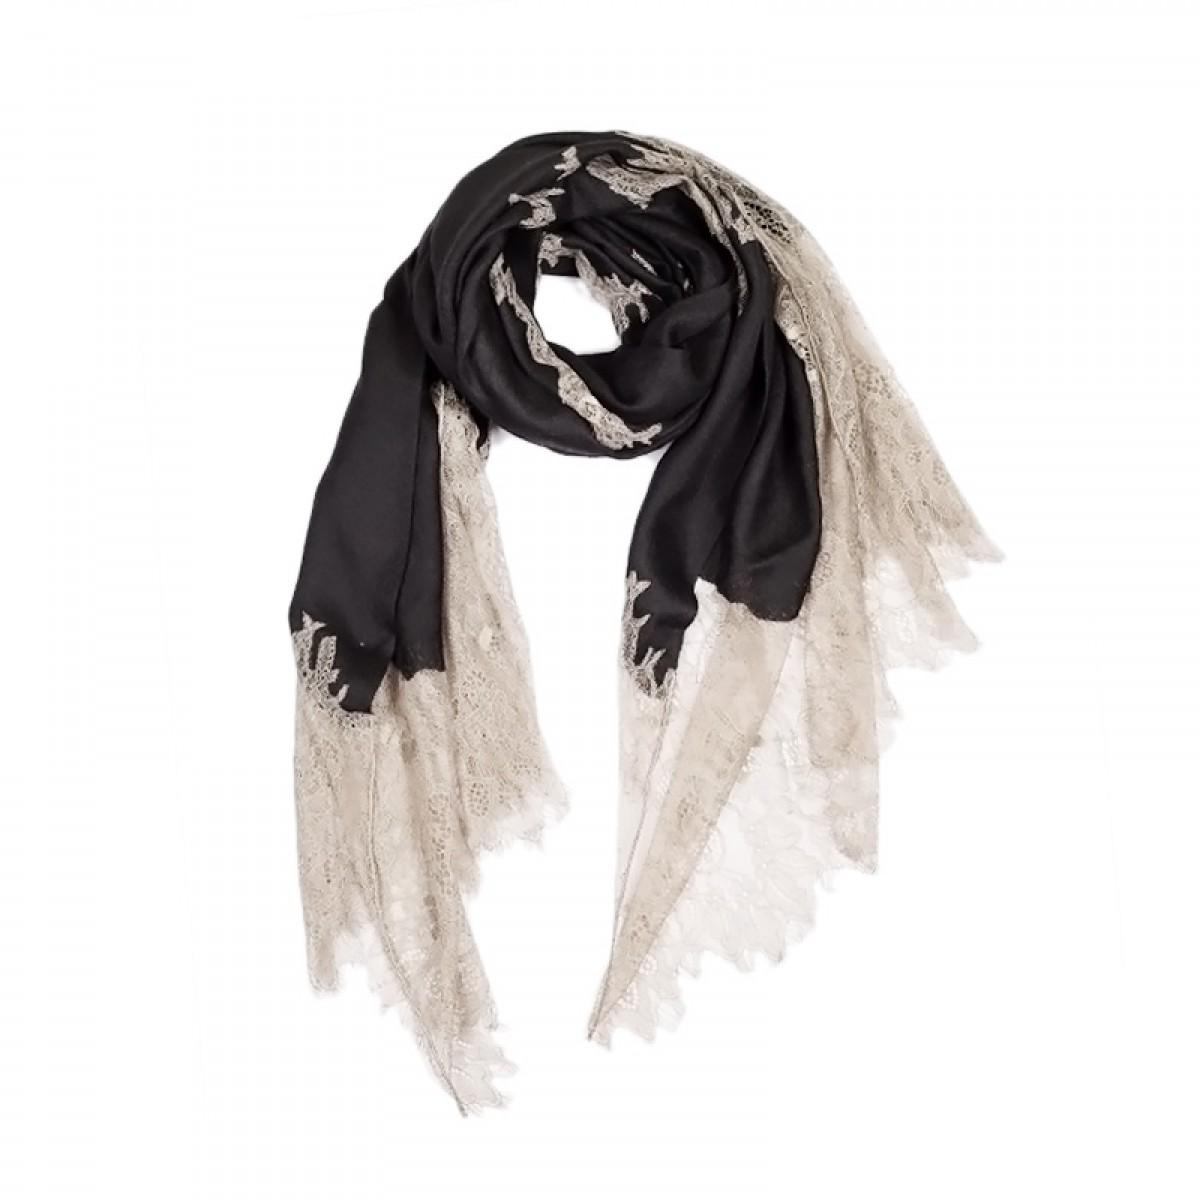 Lace Twill Pashmina Scarf Stripes Across  - Black